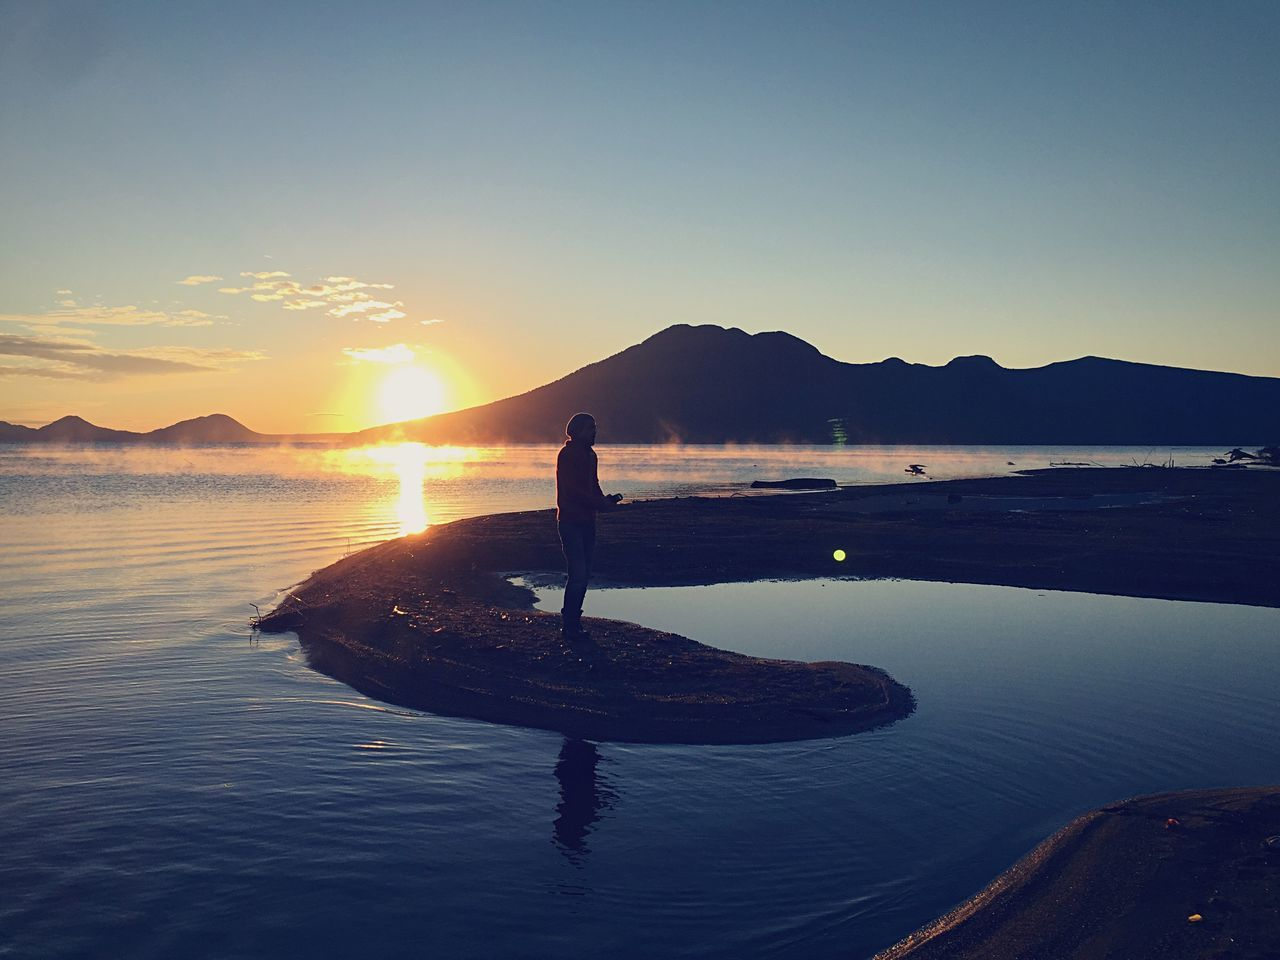 Learn & Shoot: Single Light Source Camping Hokkaido EyeEm Best Shots - Sunsets + Sunrise Natural Beauty Silhouette Shikotsu Lake Mist Enjoying The Sun Japan